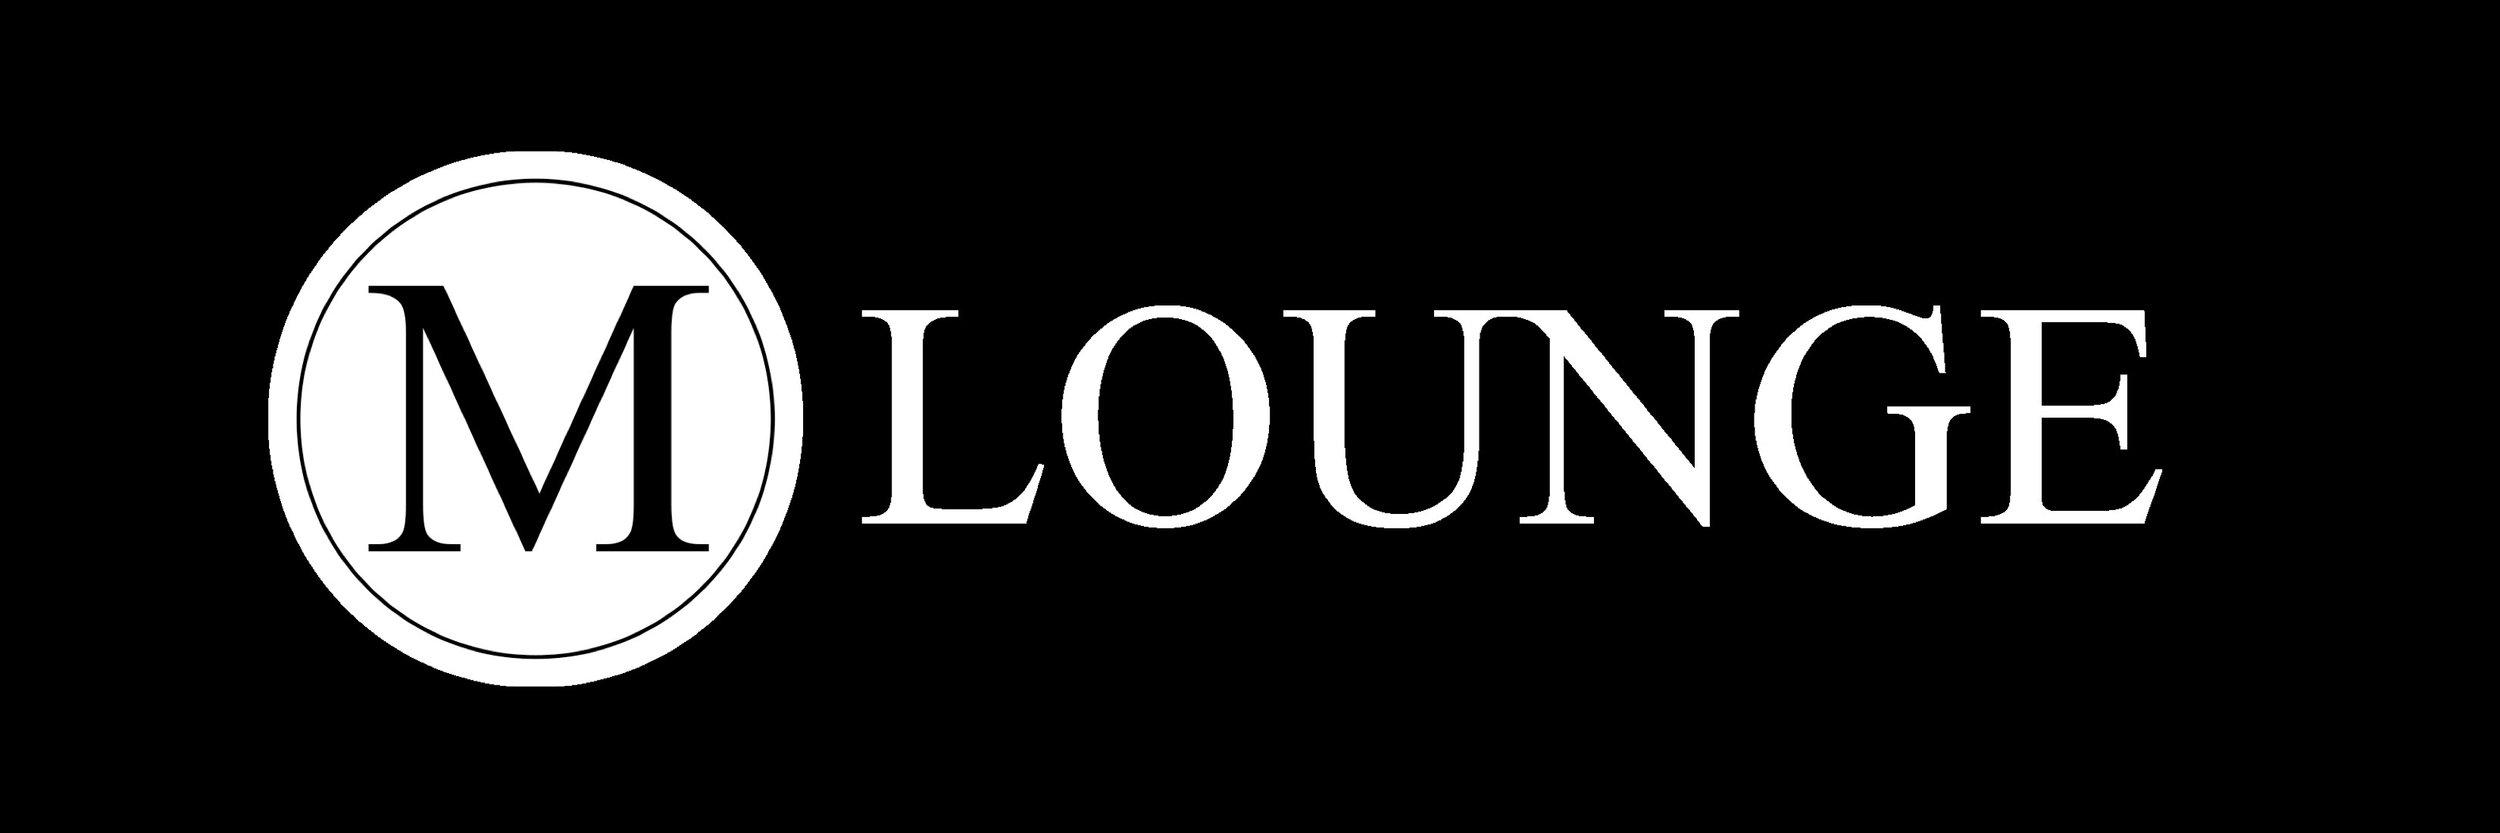 M Lounge Orlando